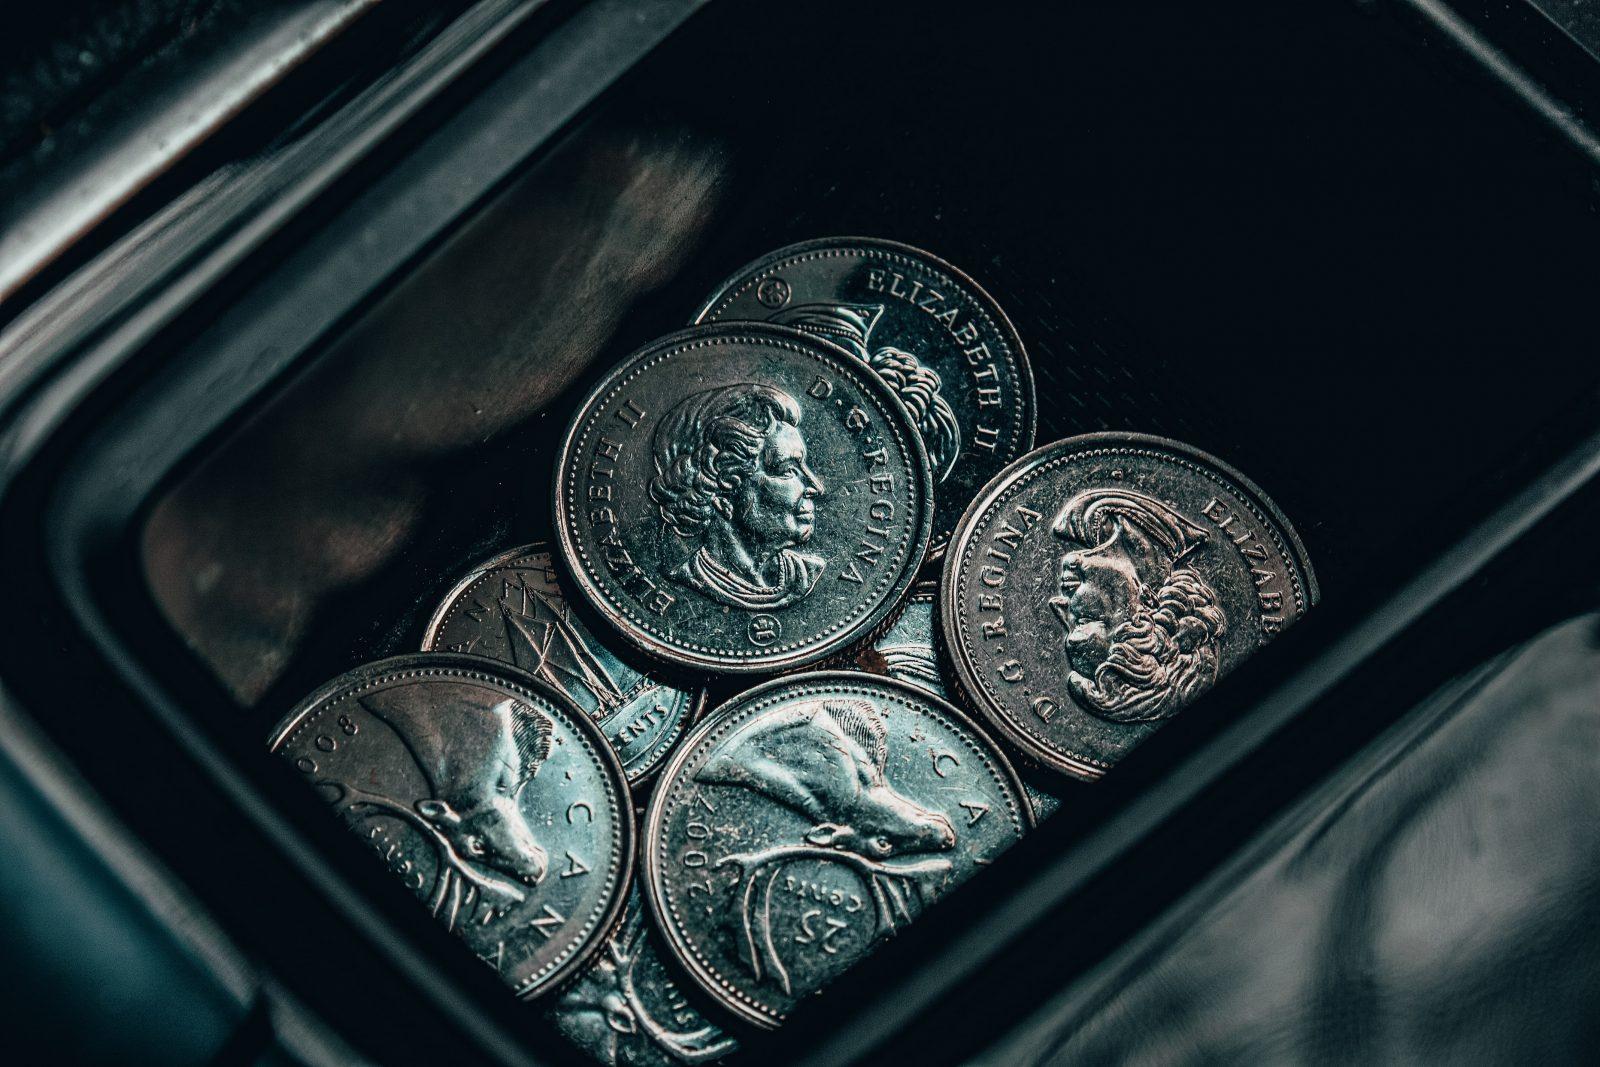 Tip for valet services